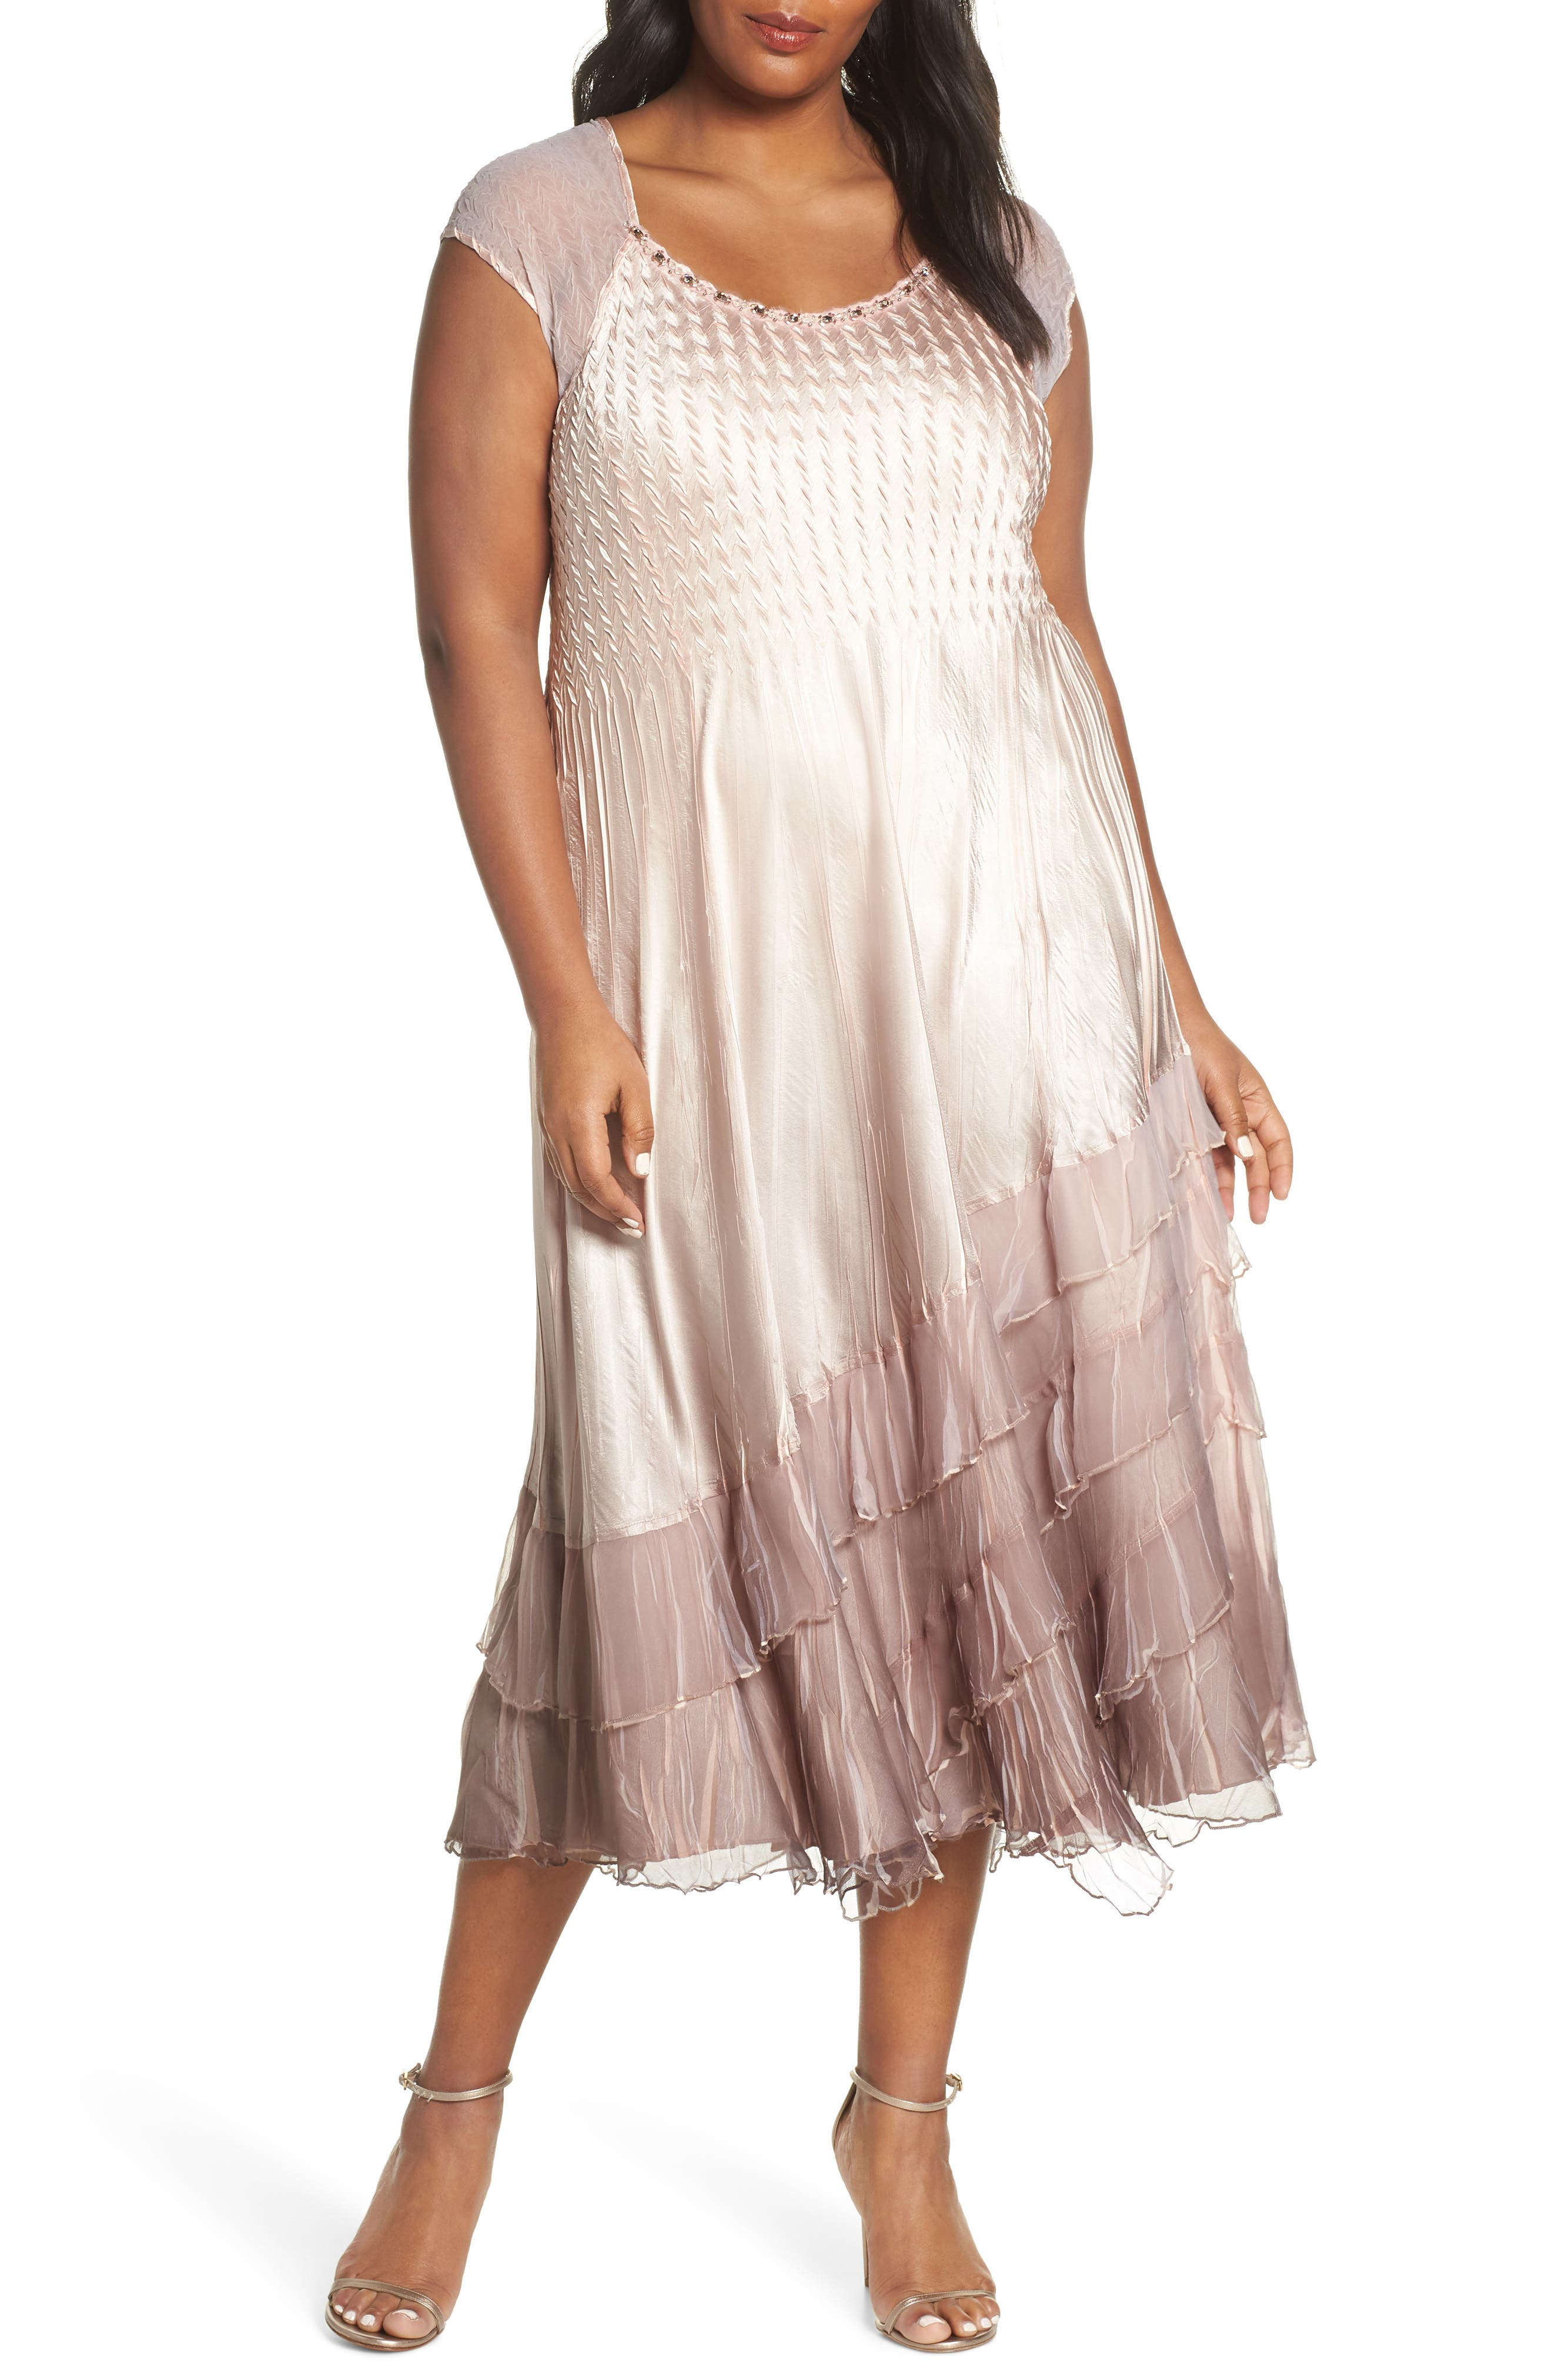 KOMAROV, Tiered Hem Ombré Dress with Jacket, Alternate thumbnail 4, color, VINTAGE ROSE WITH CAFE OMBRE